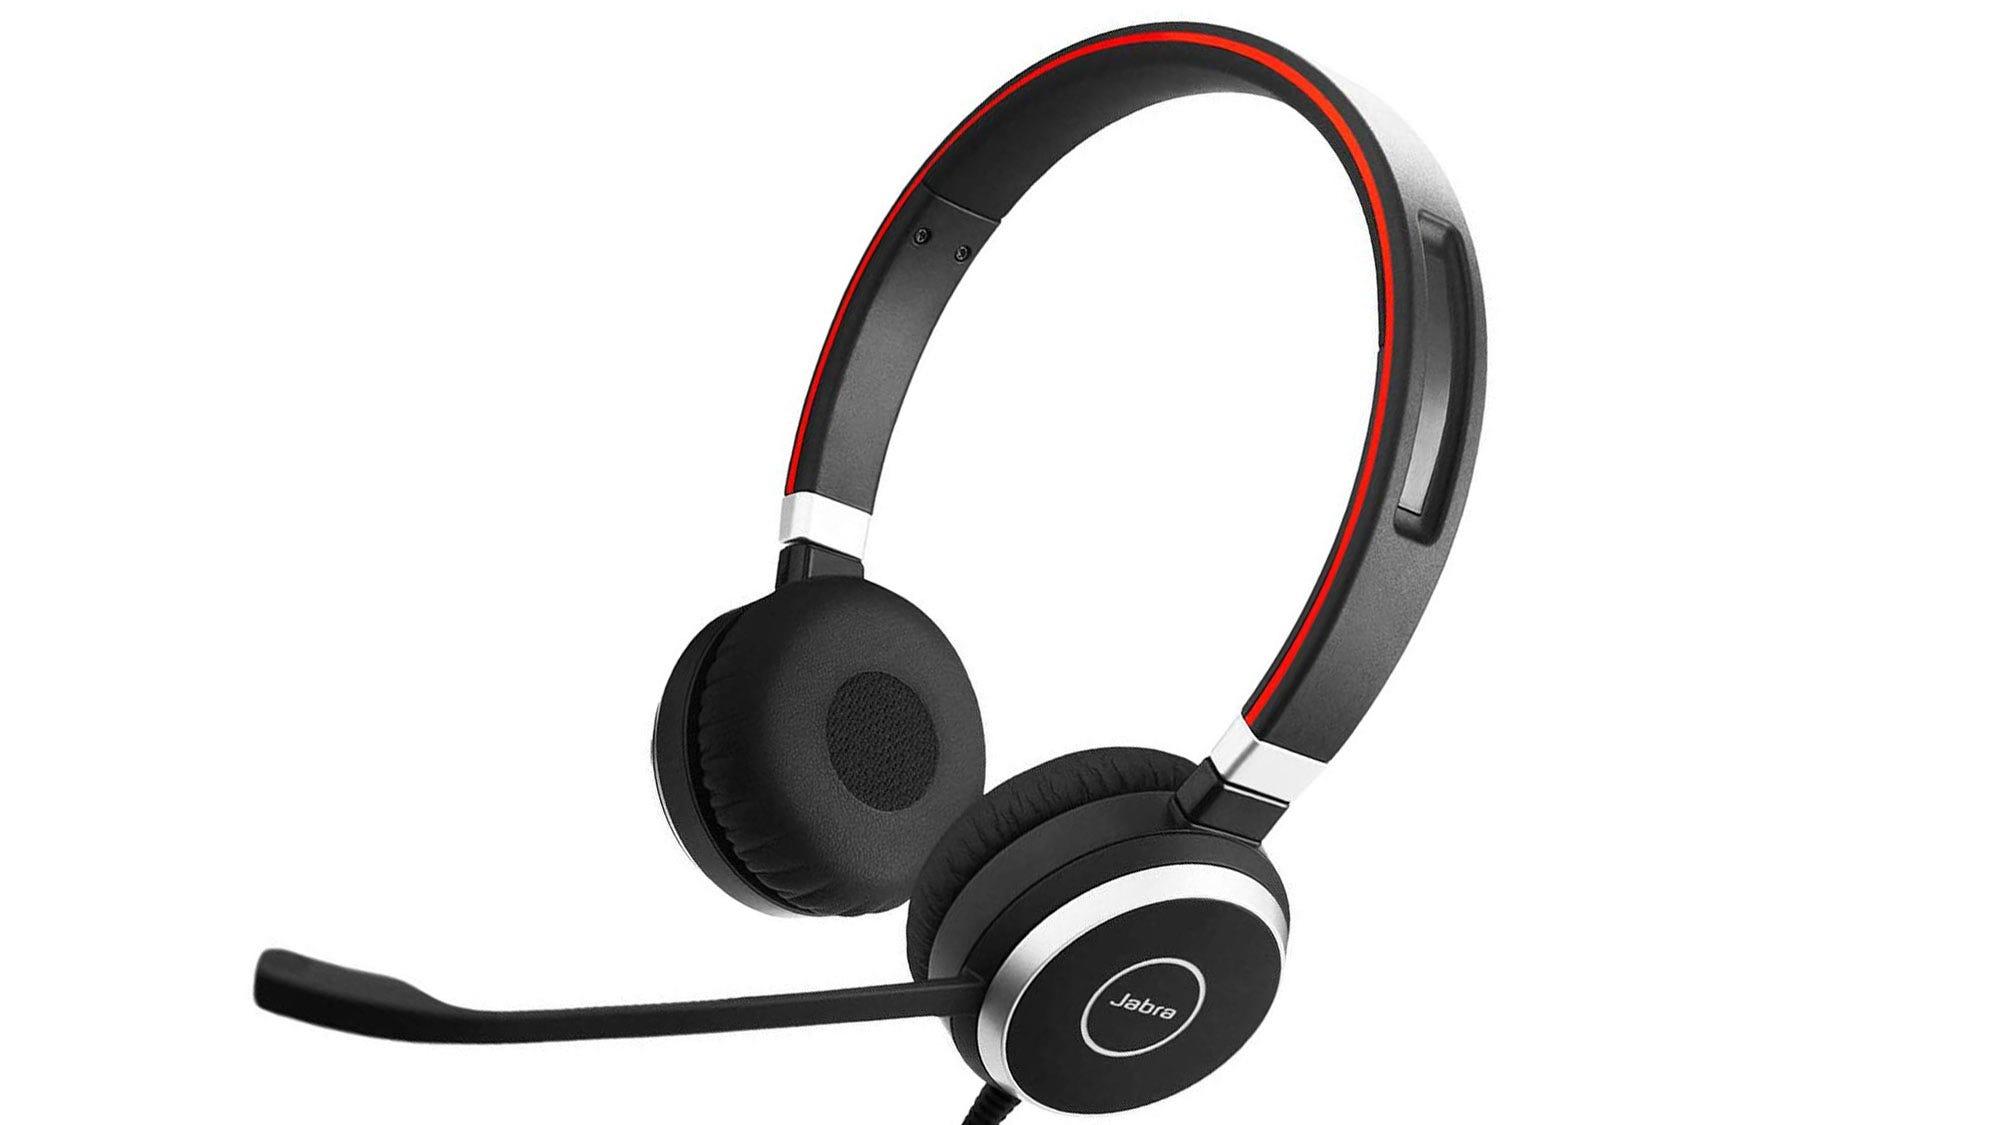 Jabra Evolve 40 headset.